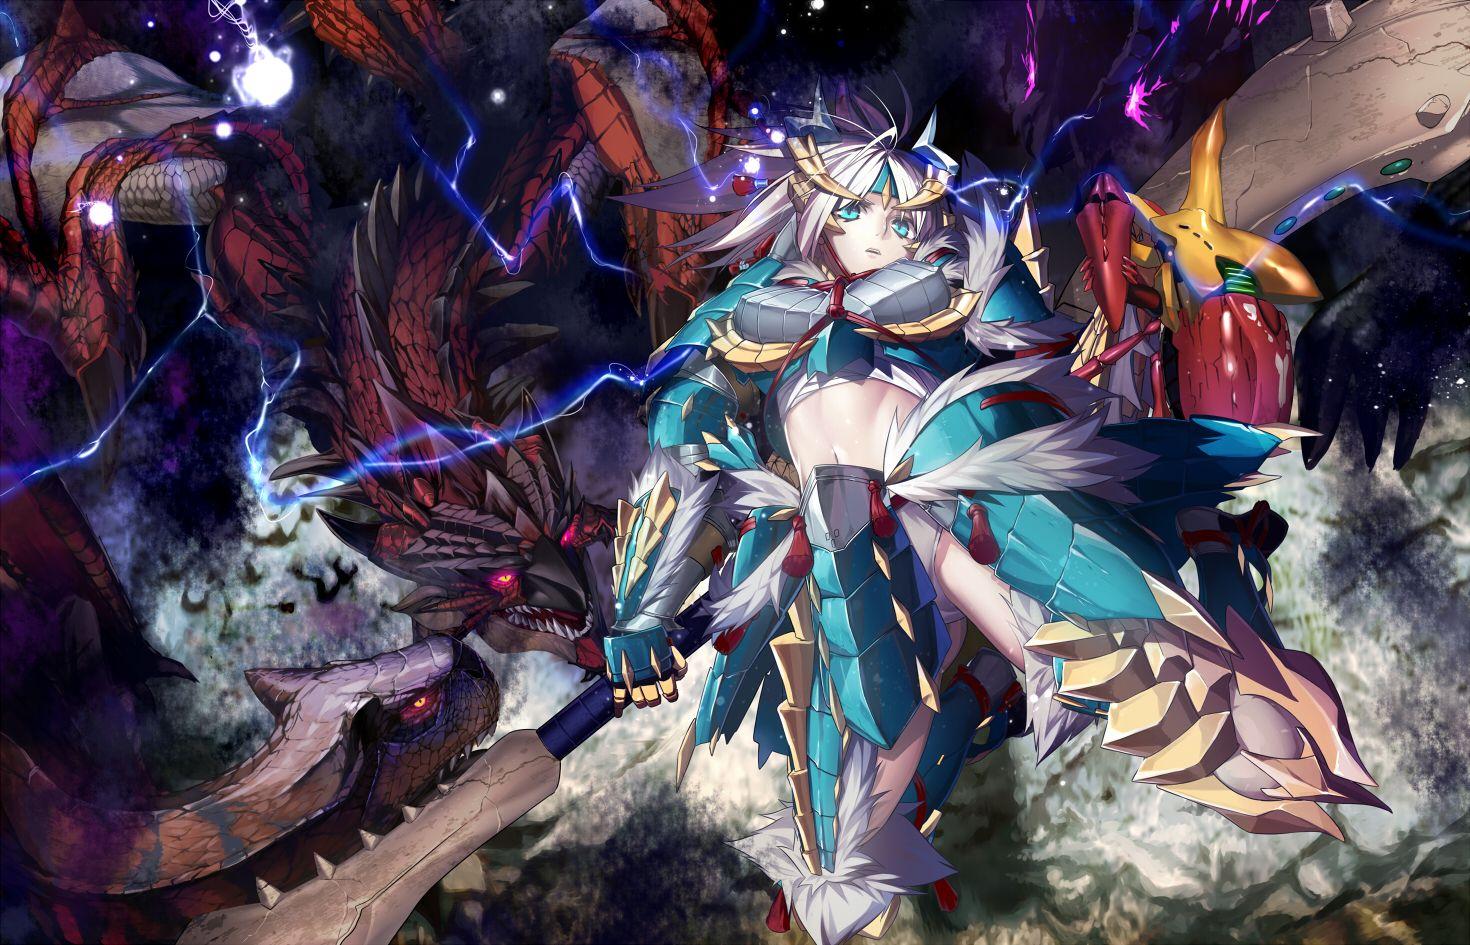 Monster Hunter Tigrex Ratholos Zinogre Armor Monster Hunter Hunter Anime Monster Hunter World